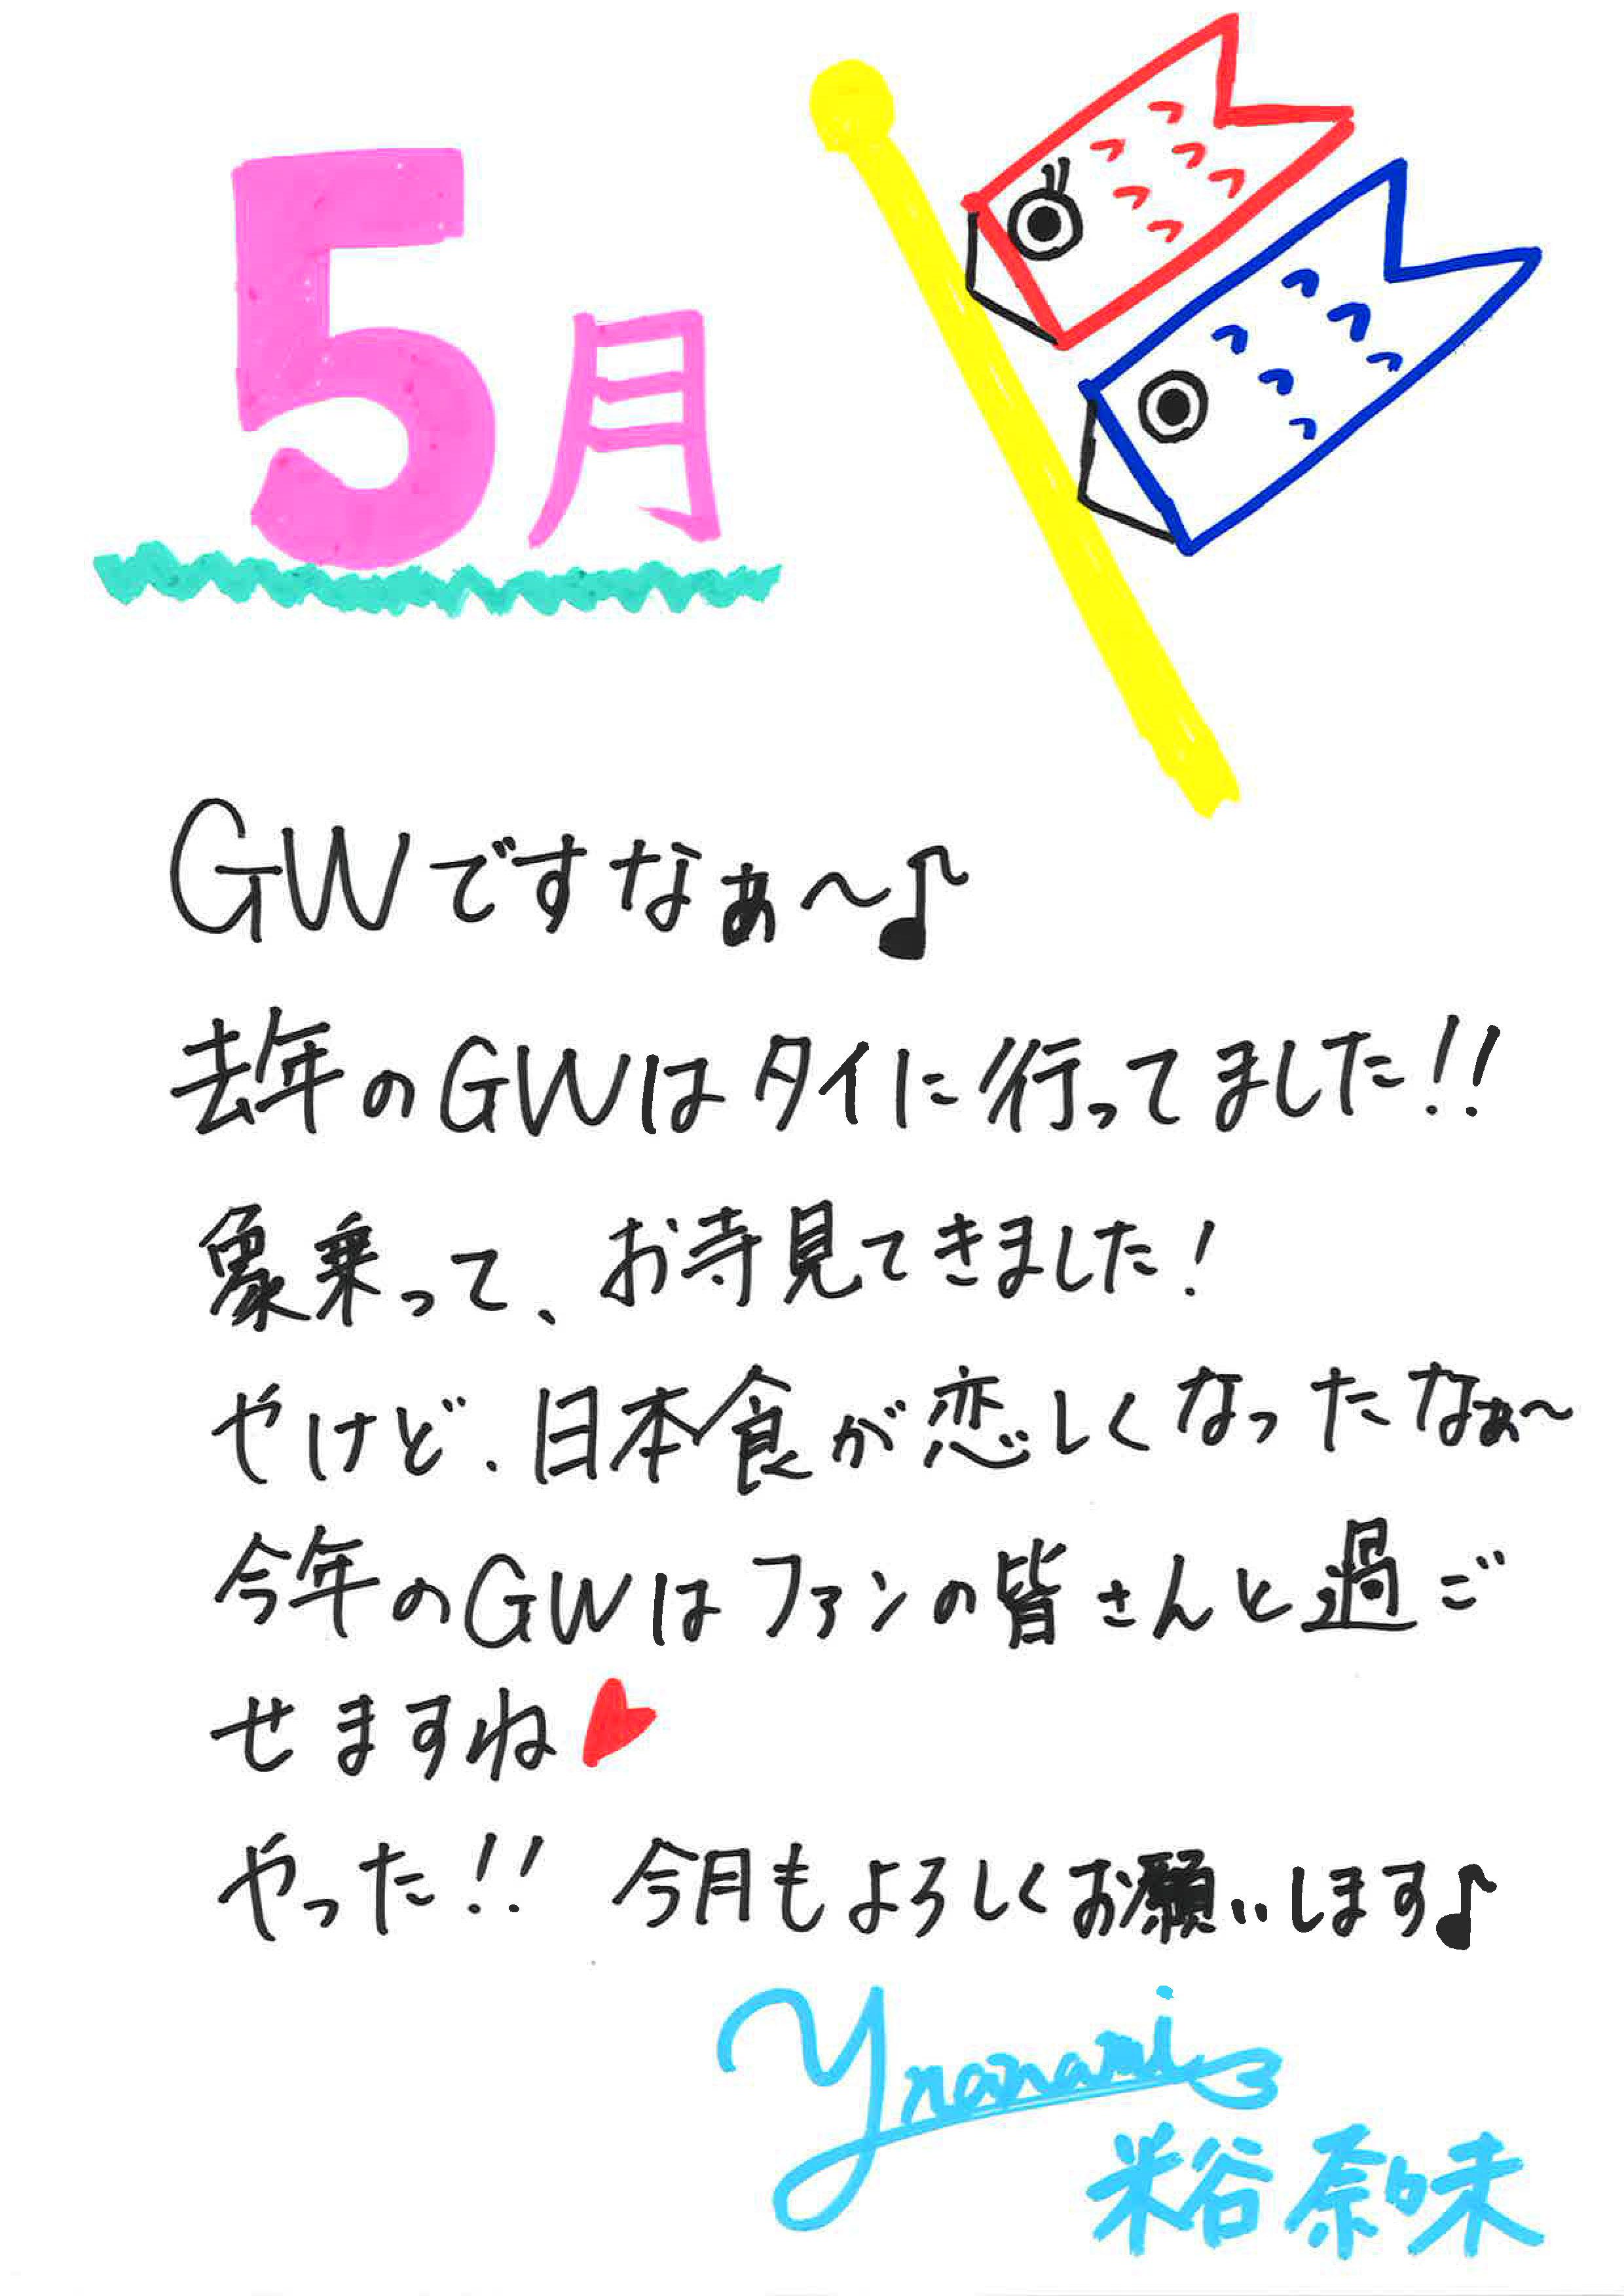 G201605_19_jpg